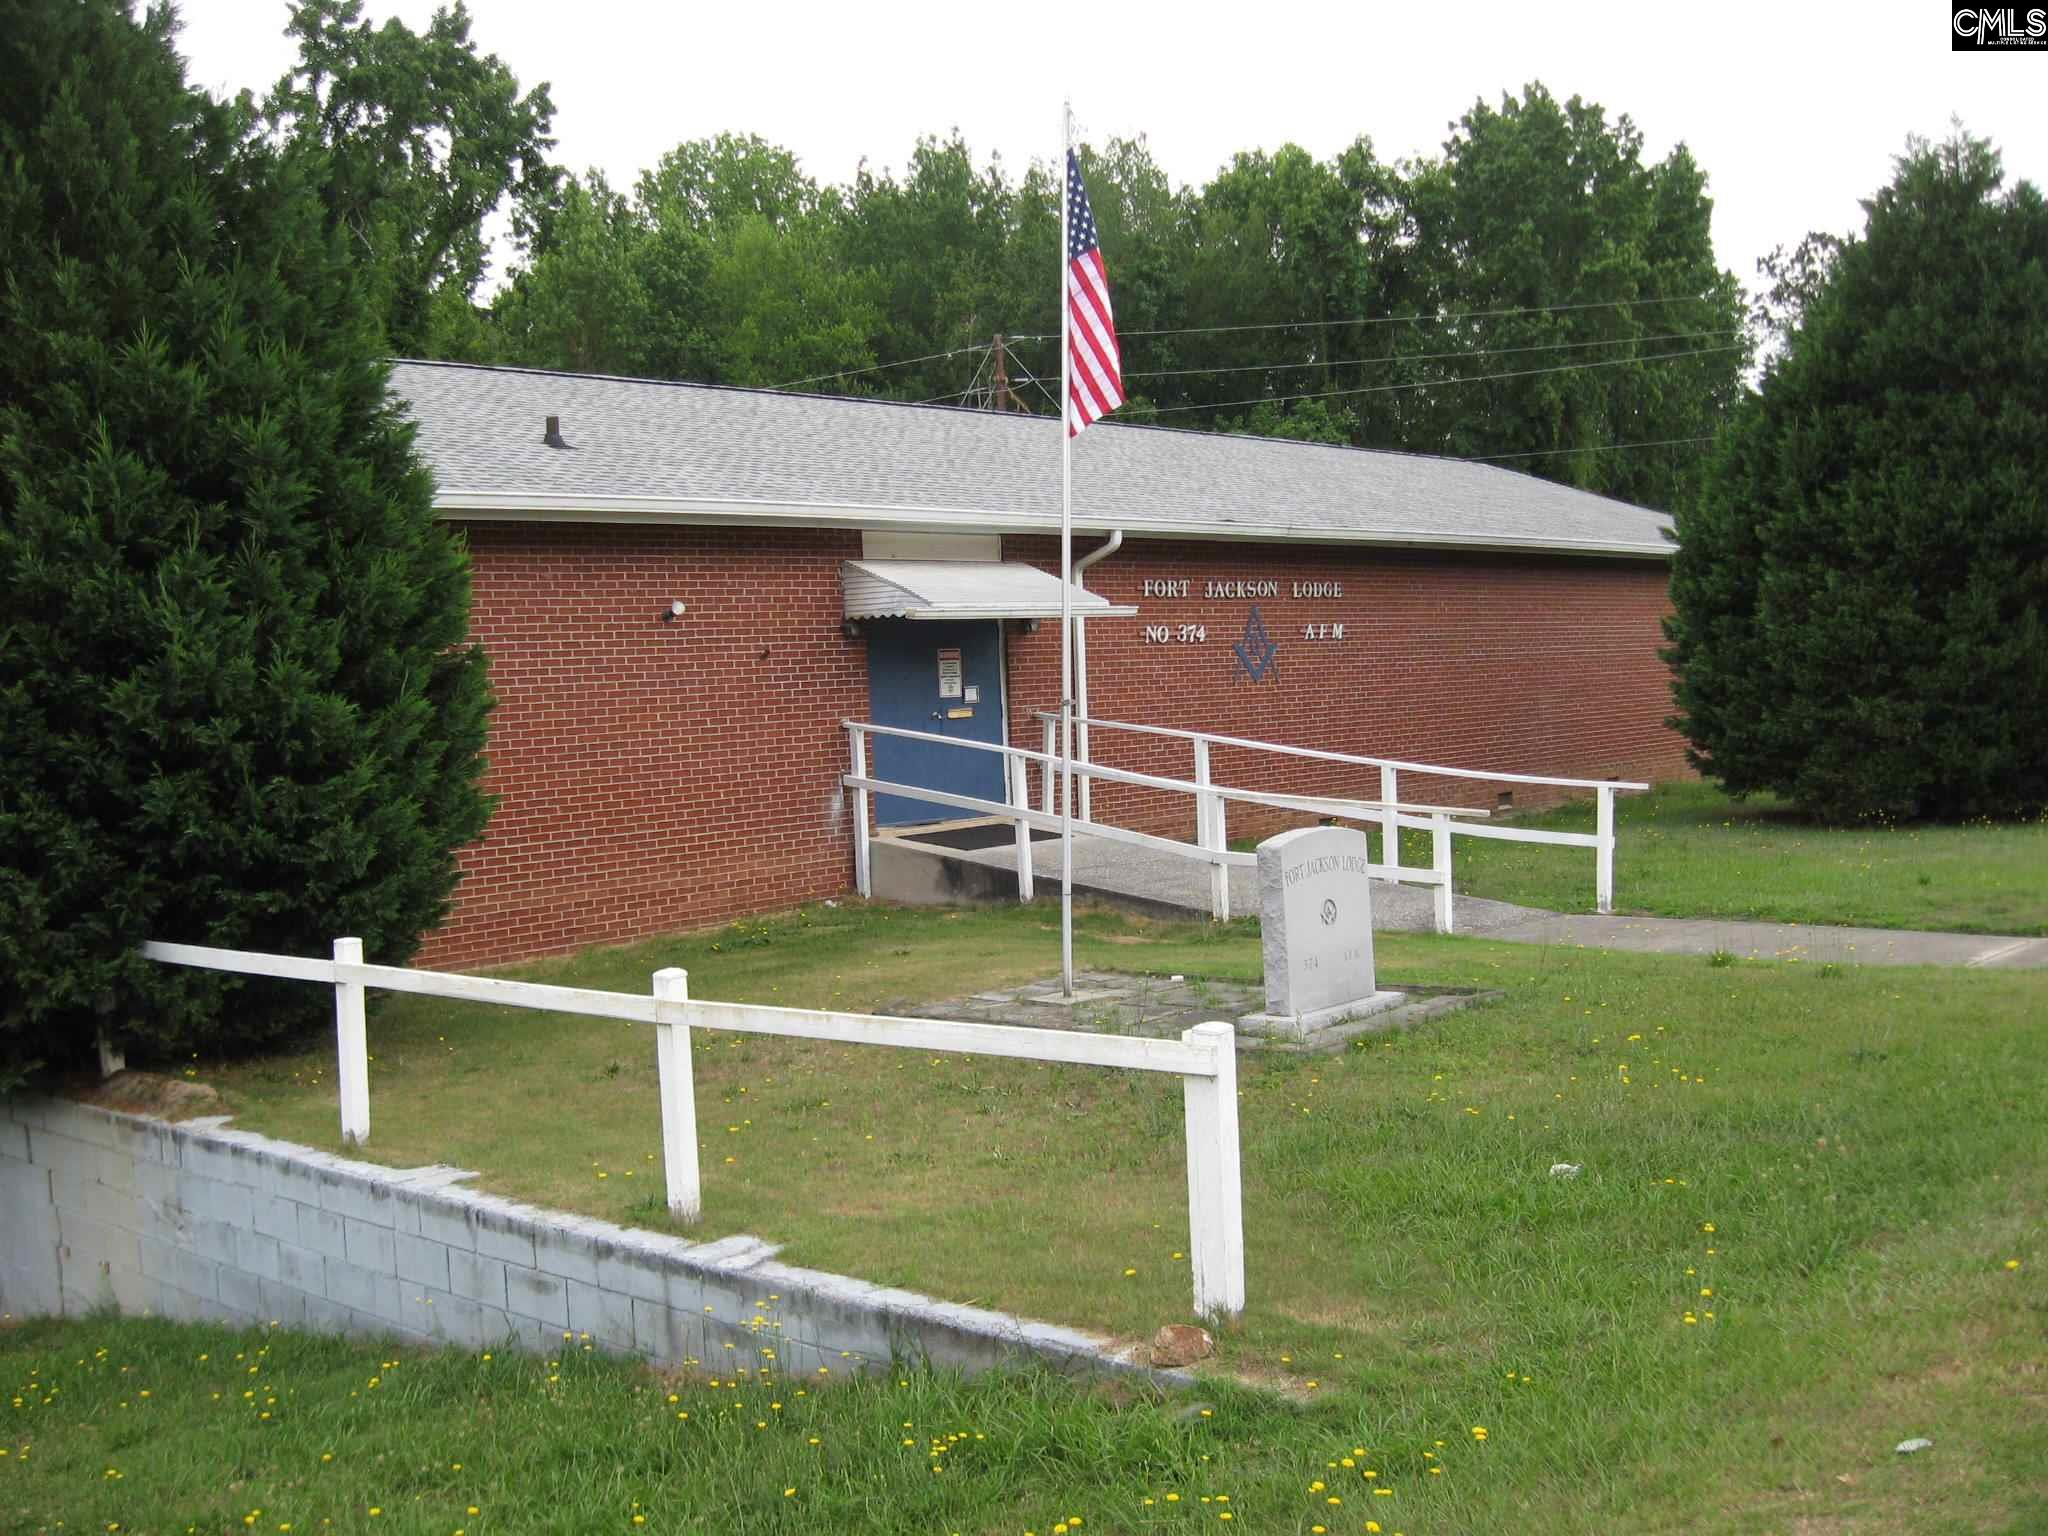 4735 Fort Jackson Columbia, SC 29209-1109